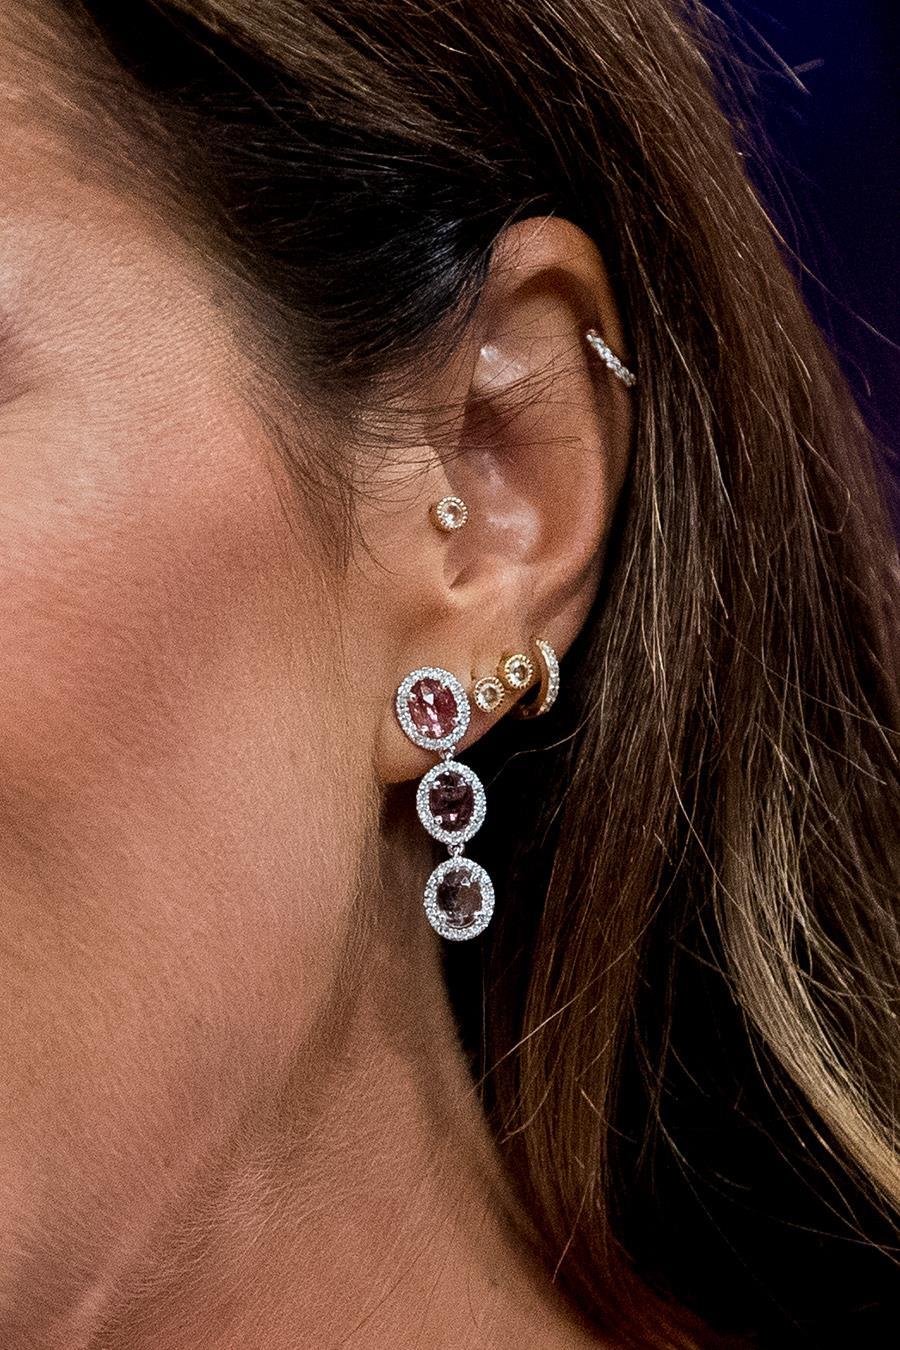 5e033d6438b0 pendientes-paula-echevarria-piercings. Pendientes top